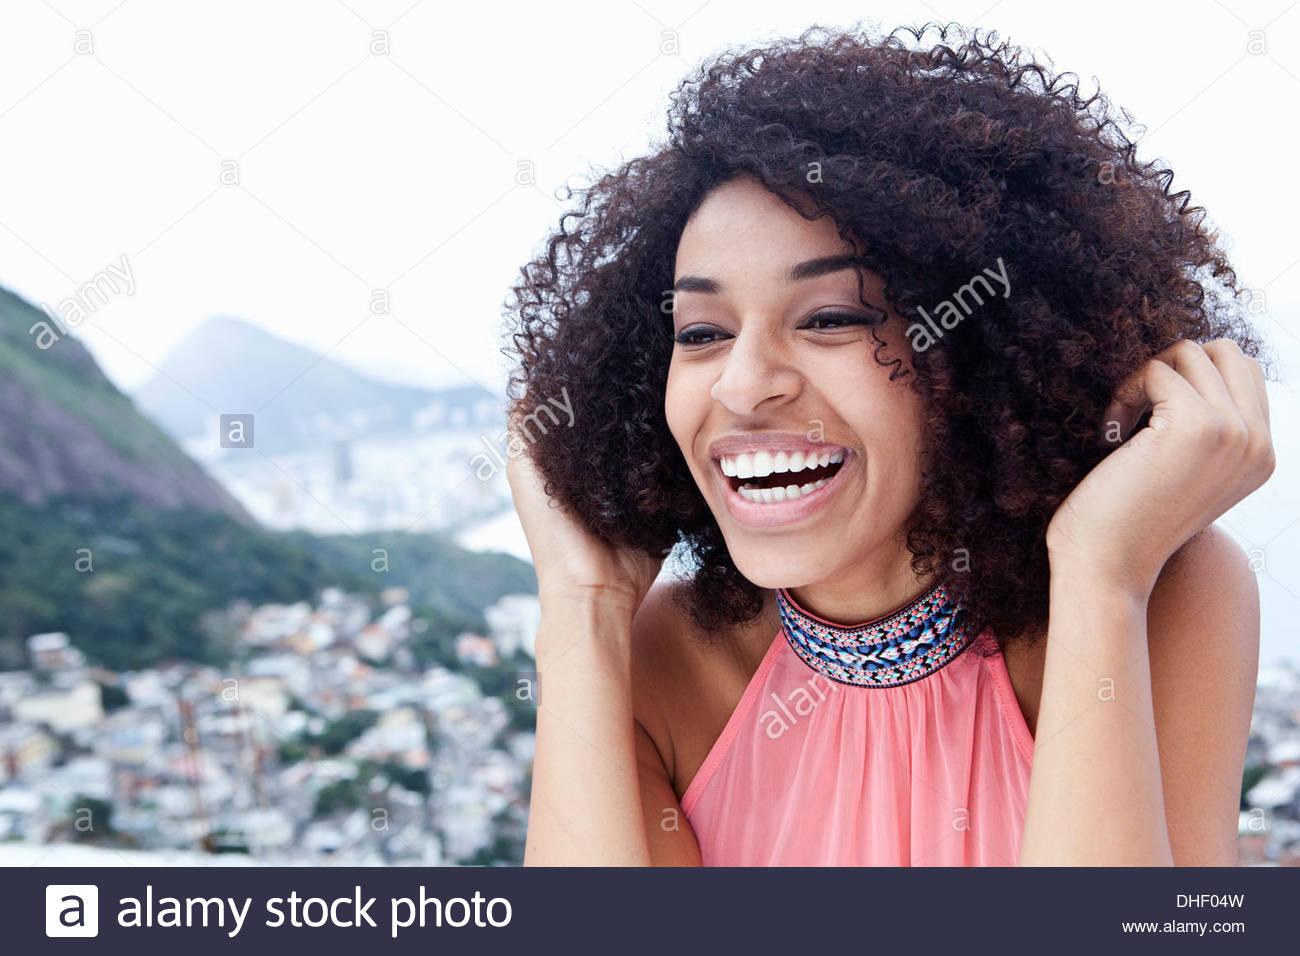 Close up portrait of happy young woman, Casa Alto Vidigal, Rio De Janeiro, Brazil - Stock Image